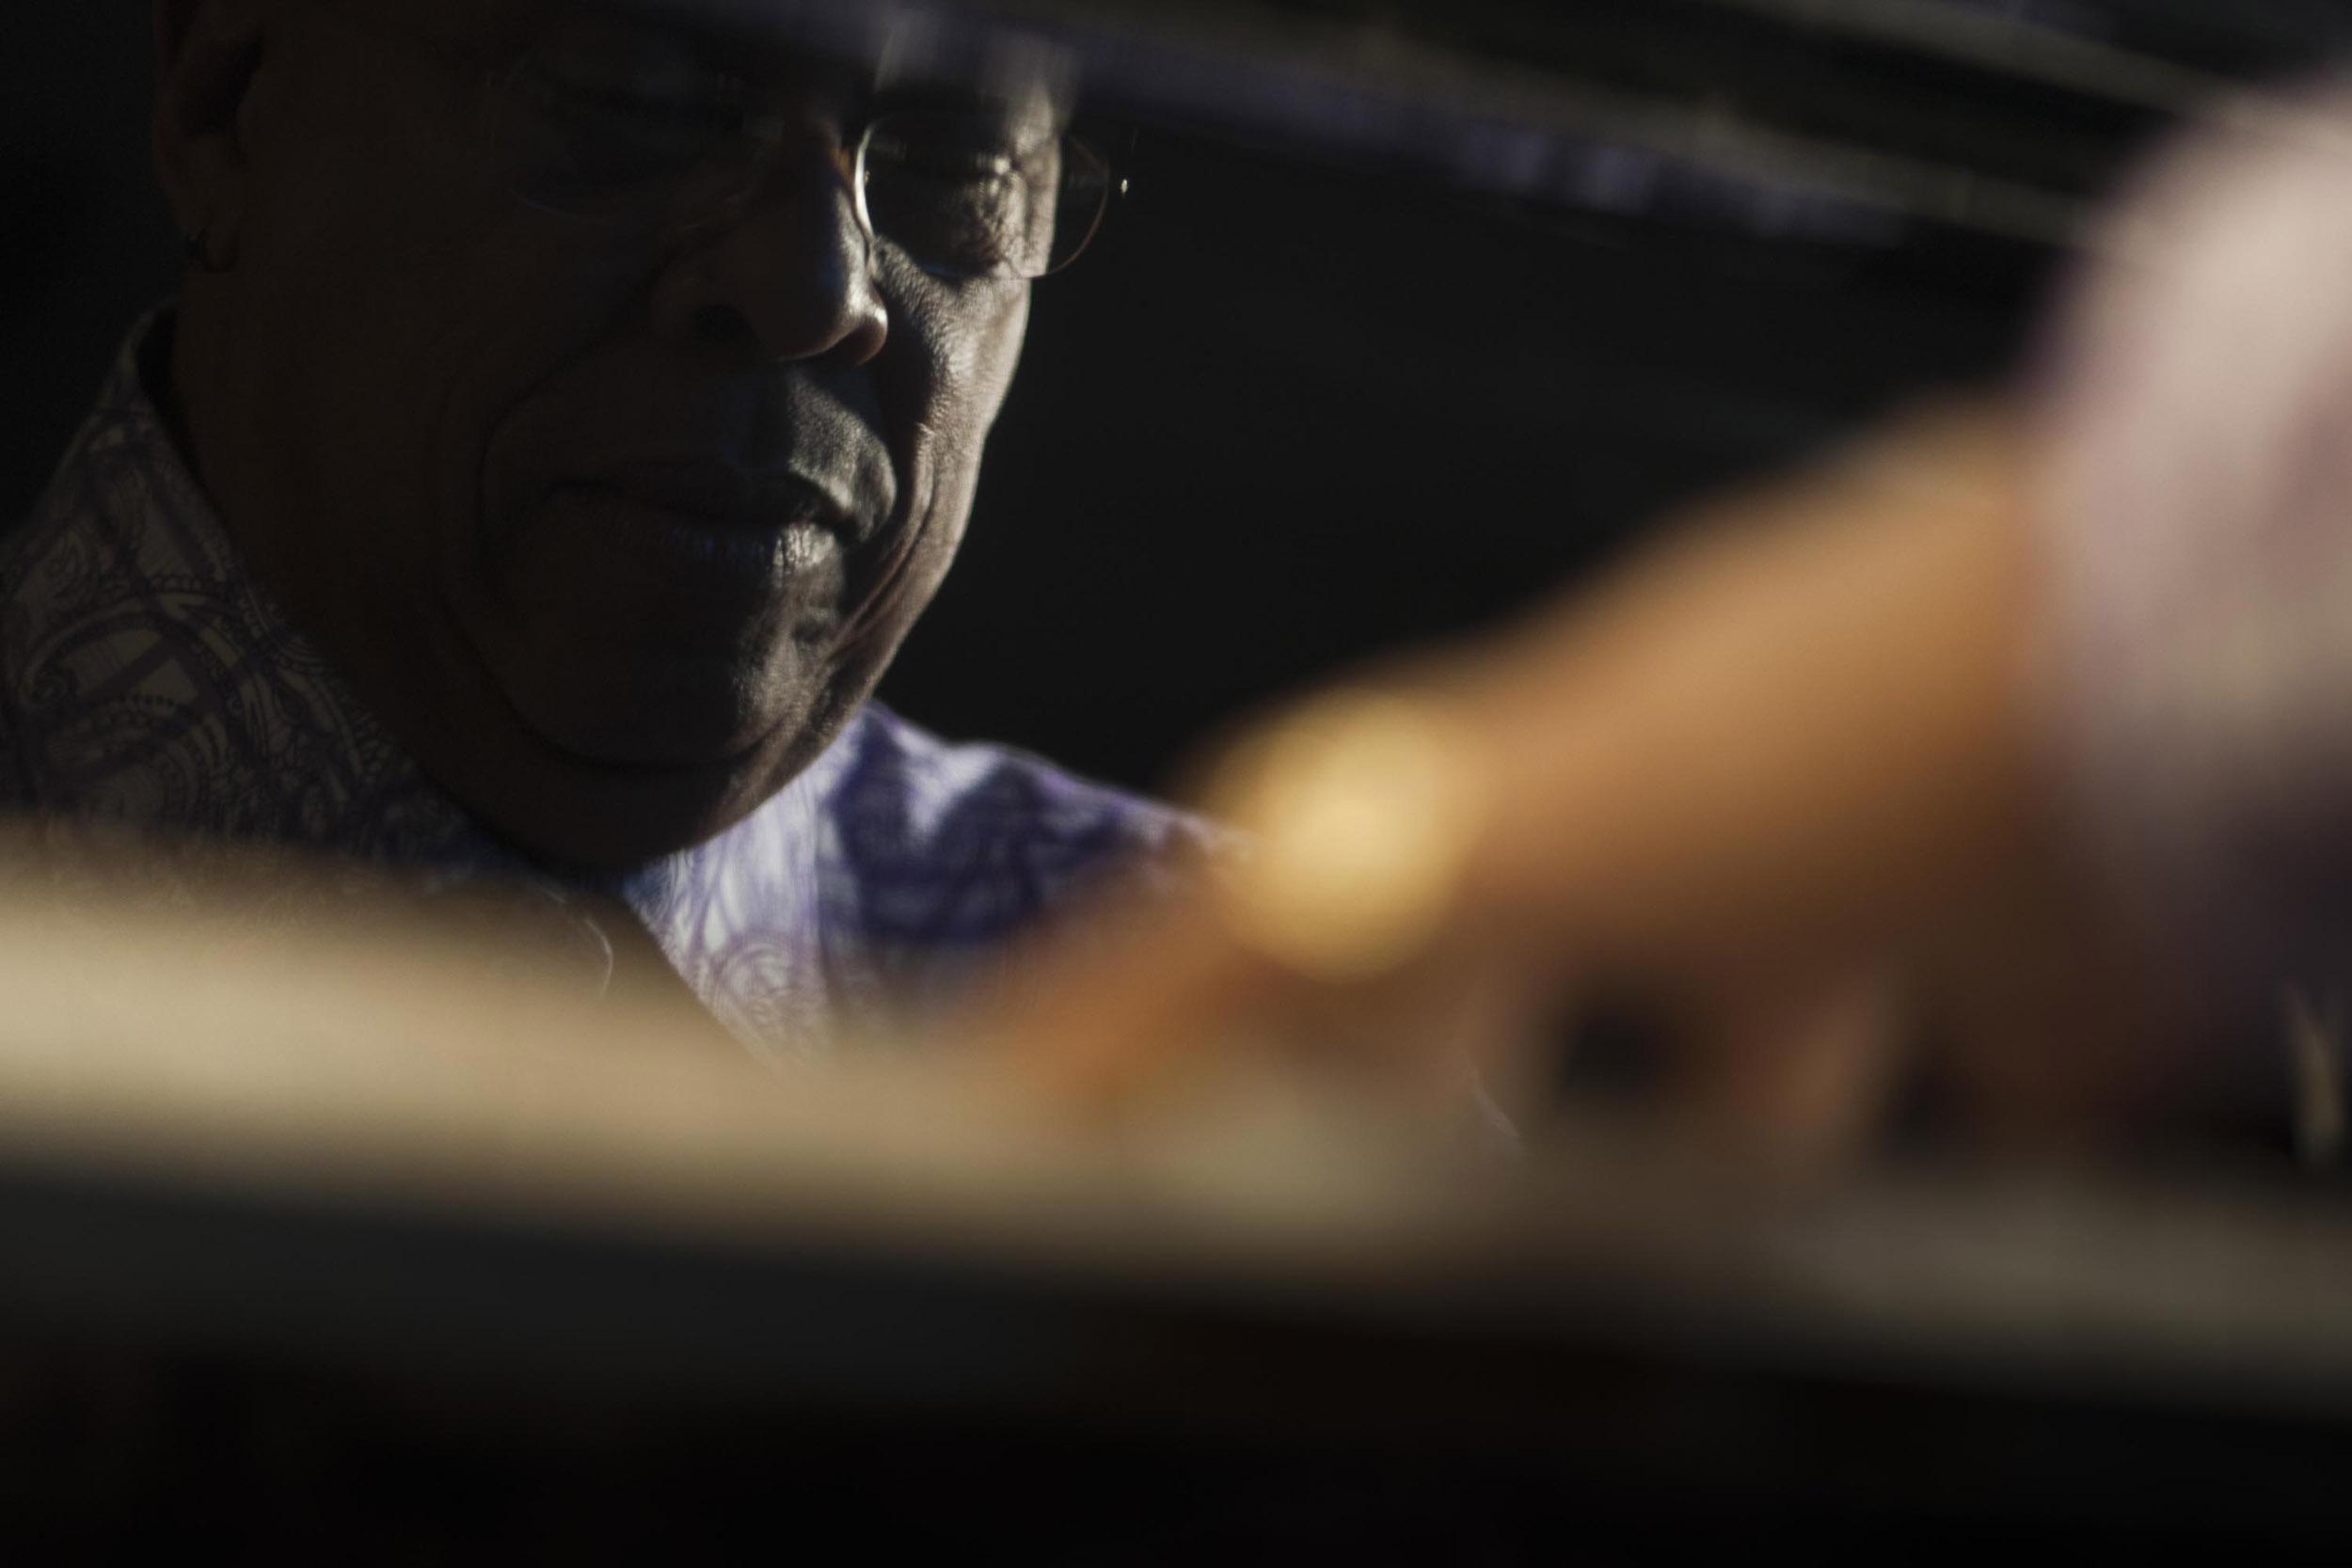 Chucho Valdés, musician - Illuminated Cuba - Hector Garrido, Aerial and human photography